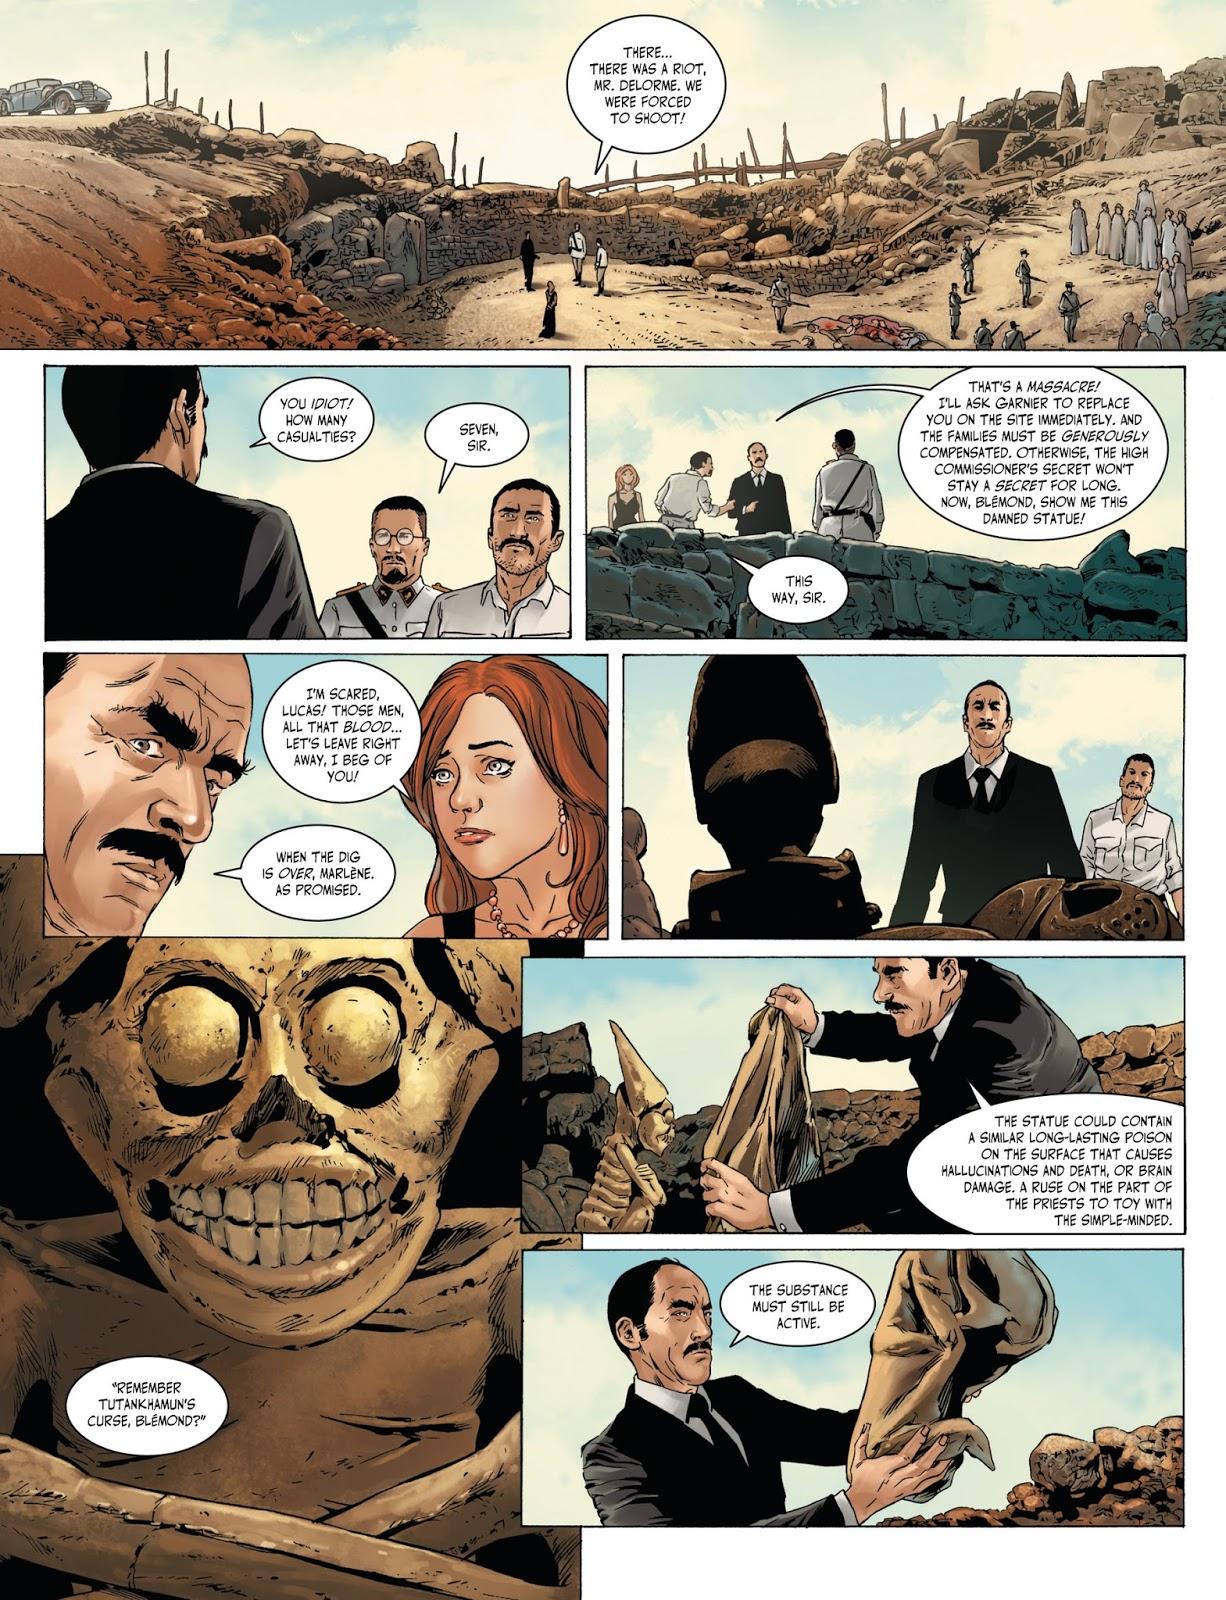 Sanctum Genesis review